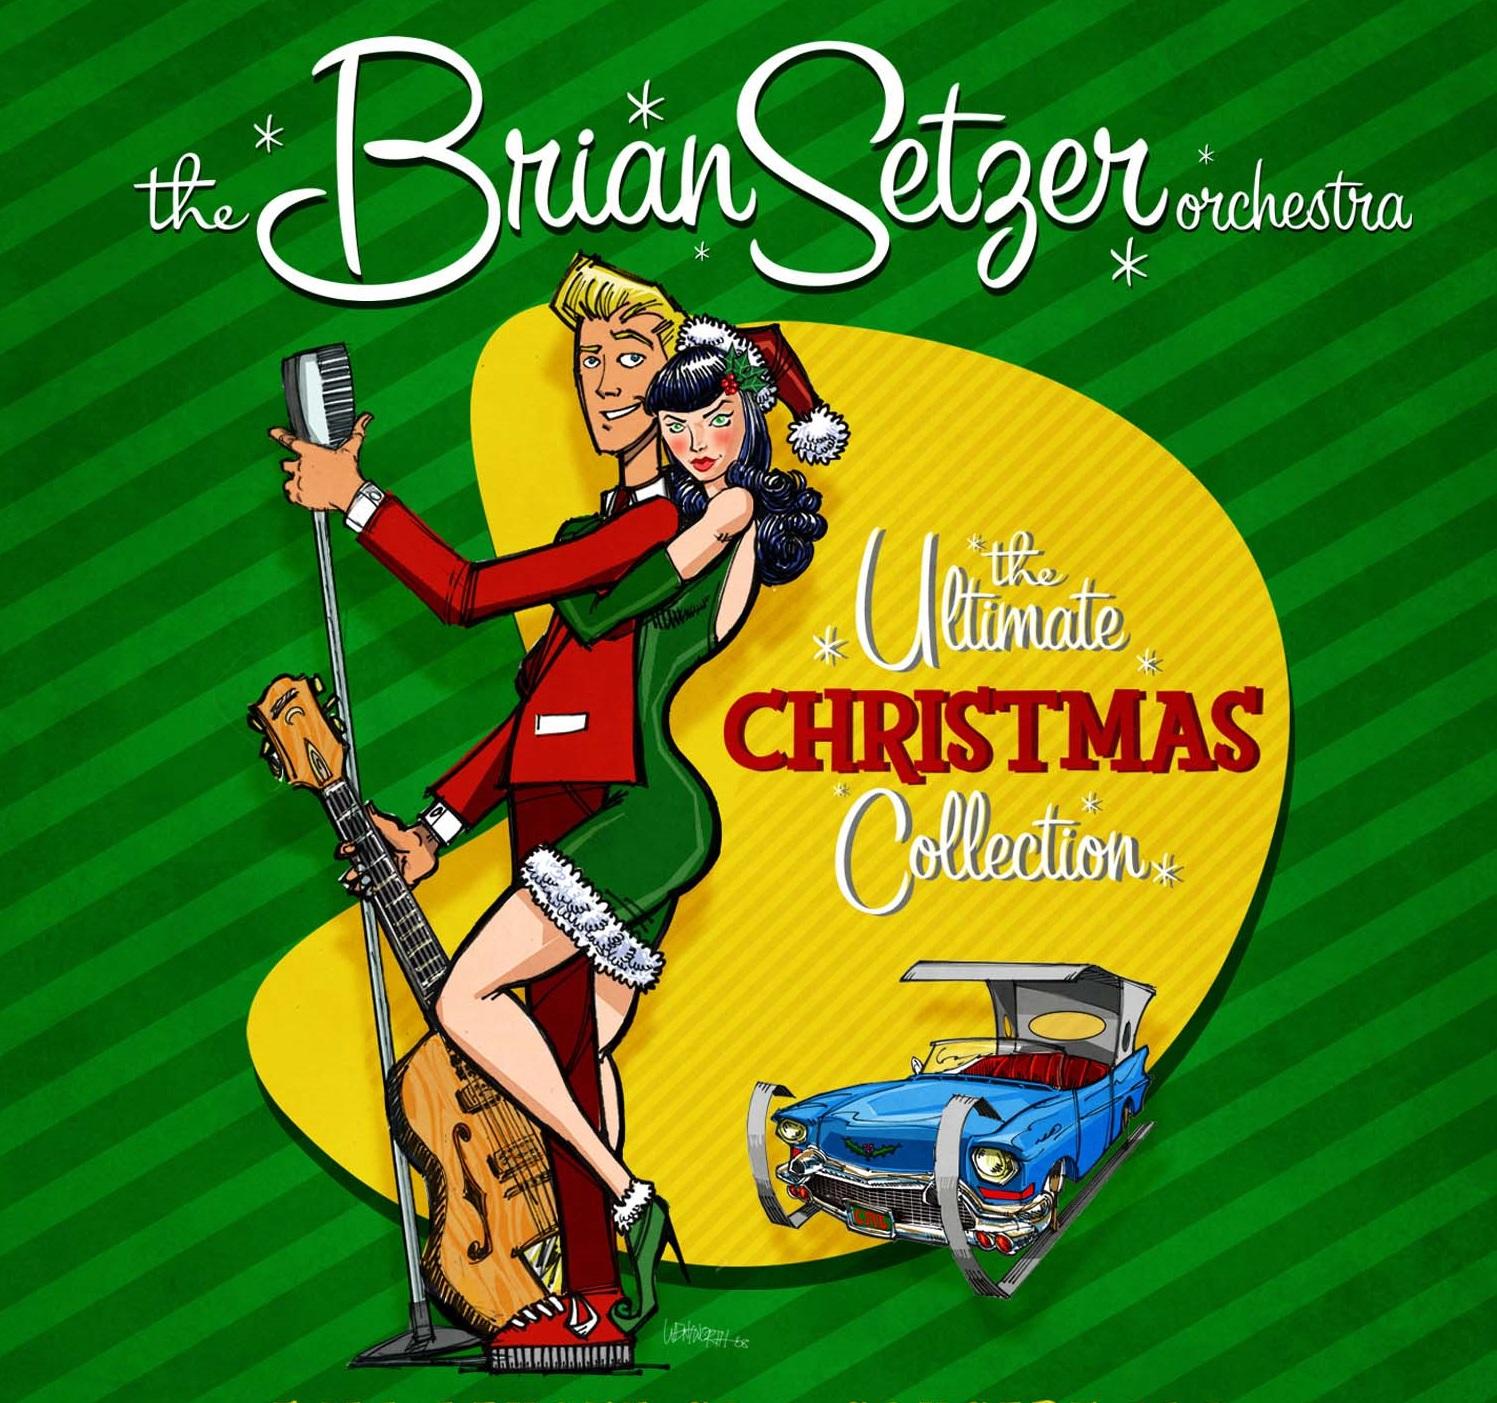 Brian Setzer Christmas.Egroj World Brian Setzer Orchestra The Ultimate Christmas